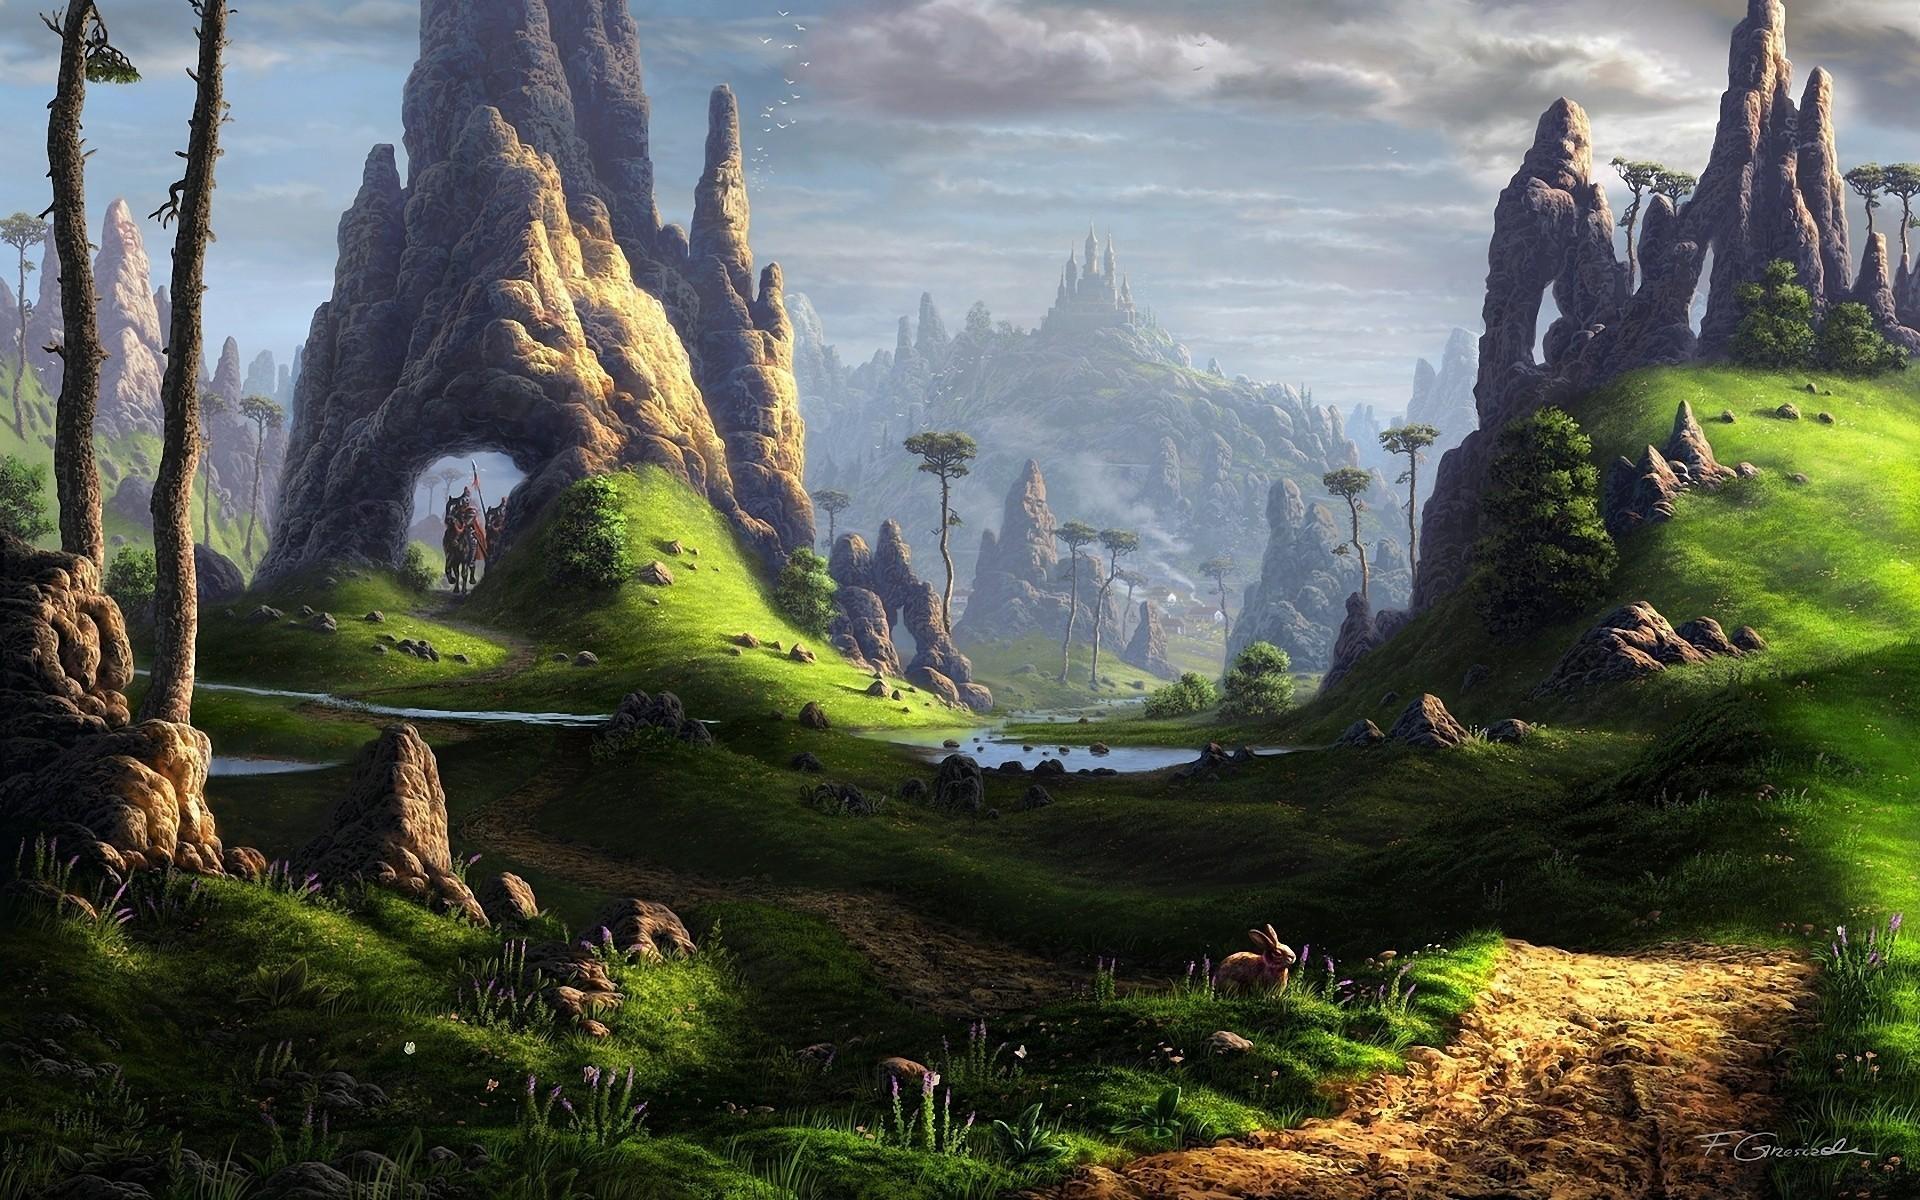 Res: 1920x1200, 2013 Fantasy 039529 wallpaper, grassland, nature, alien planet